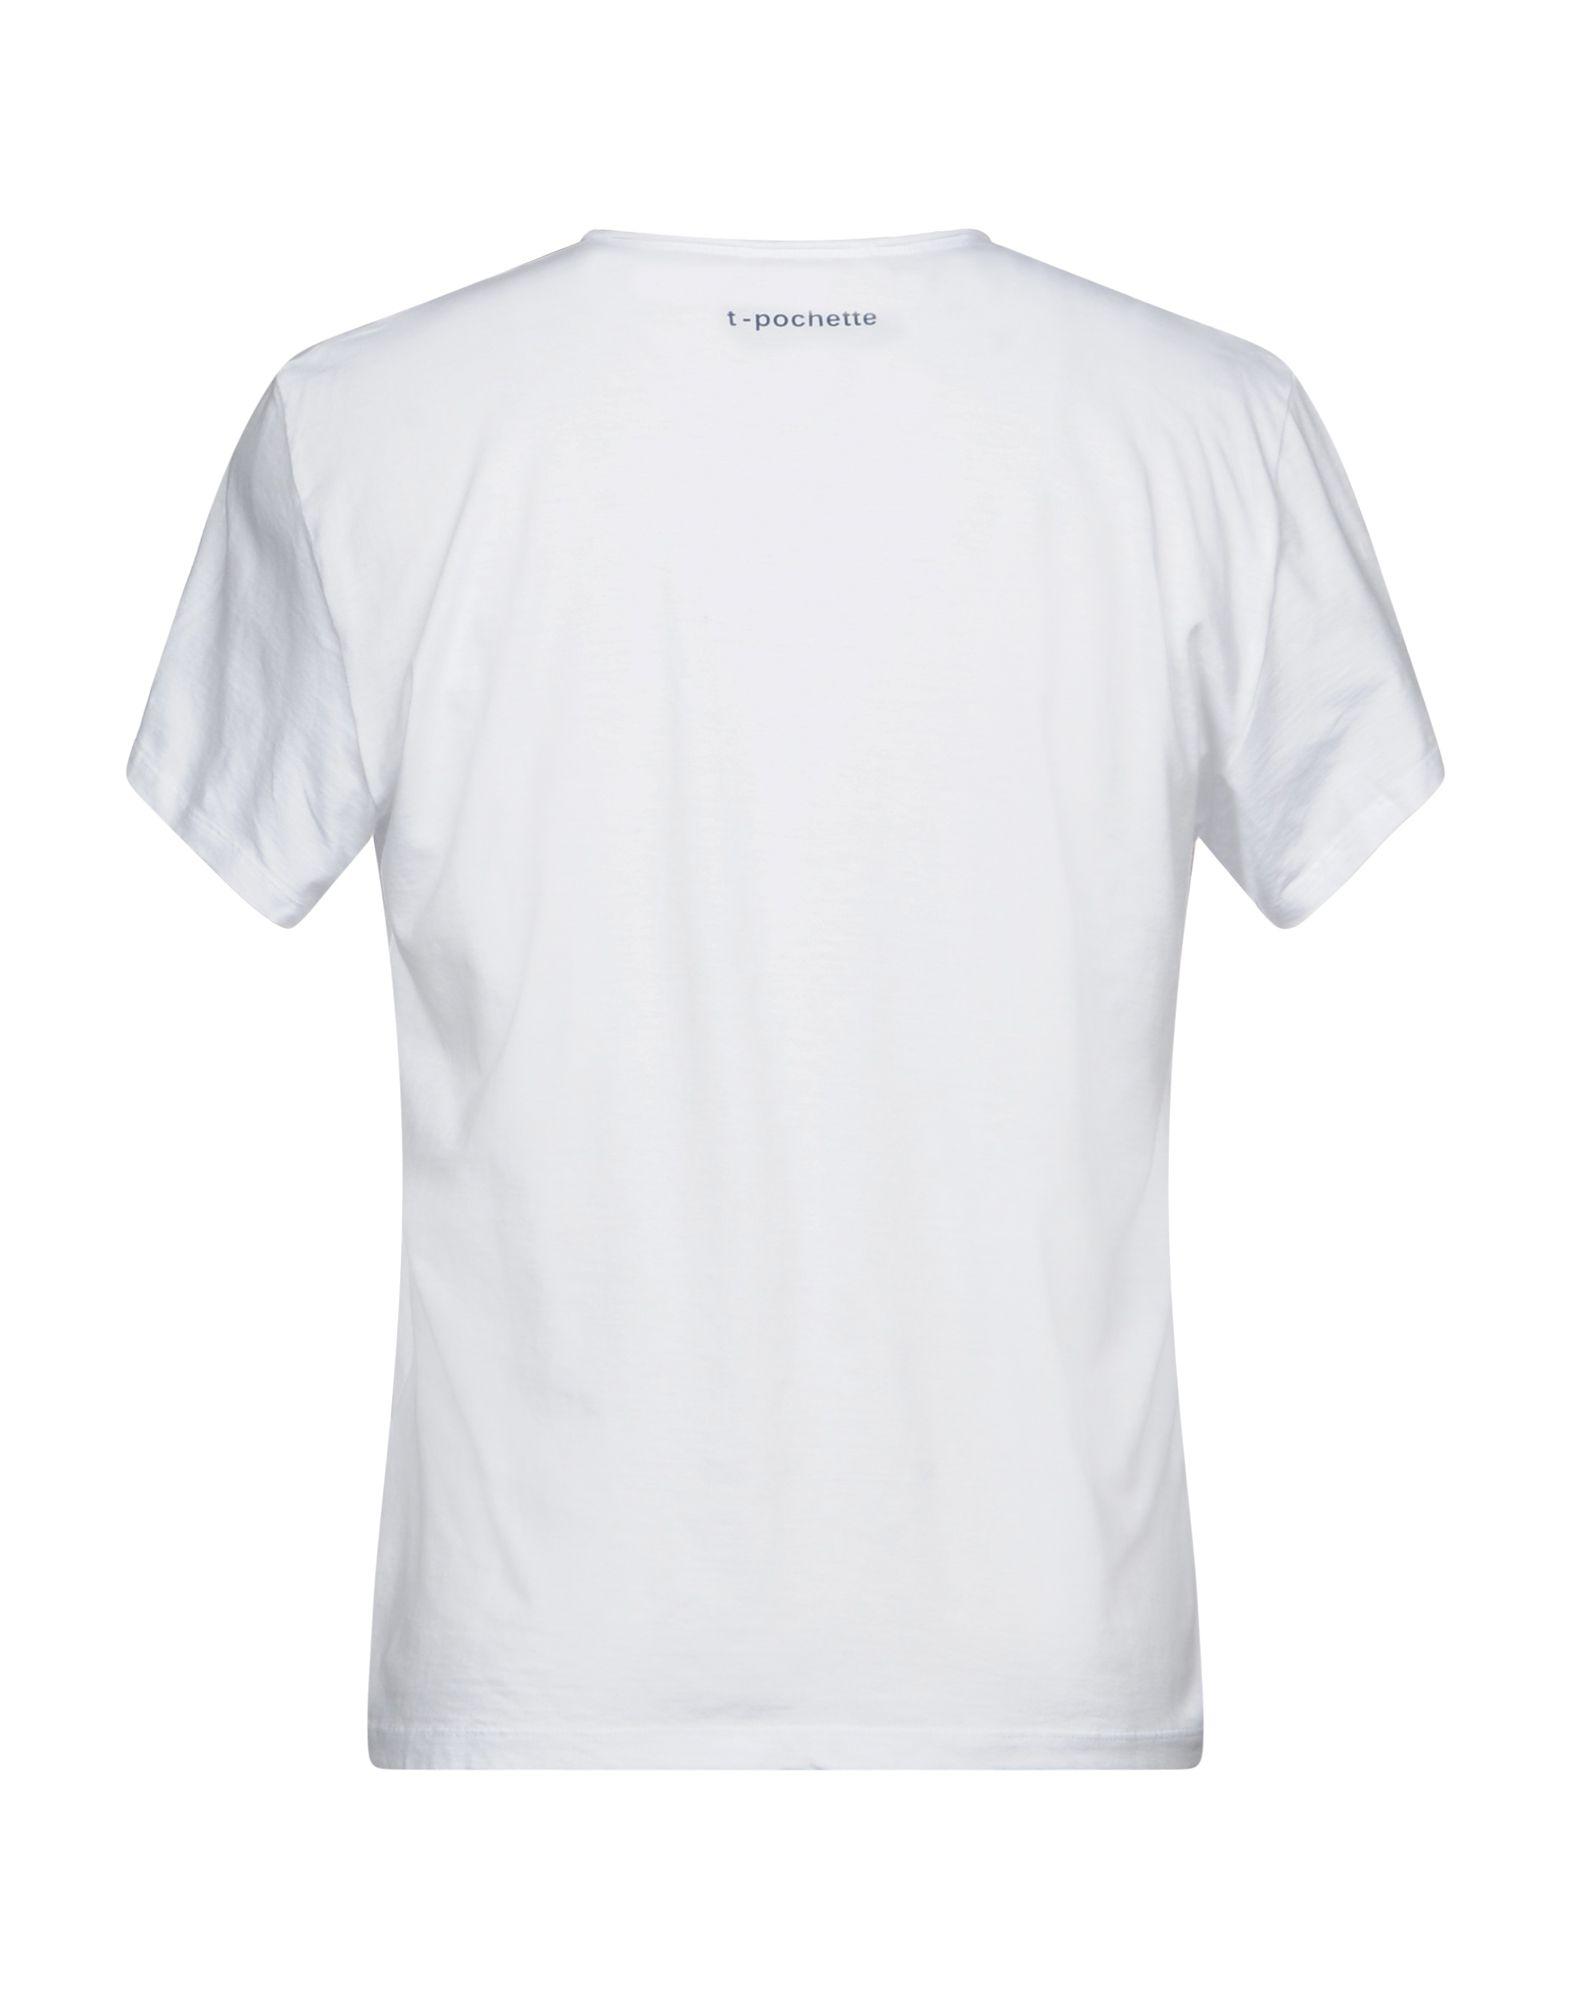 T-Shirt Roda At The Beach Beach The Uomo - 12083119PO c1dcbf